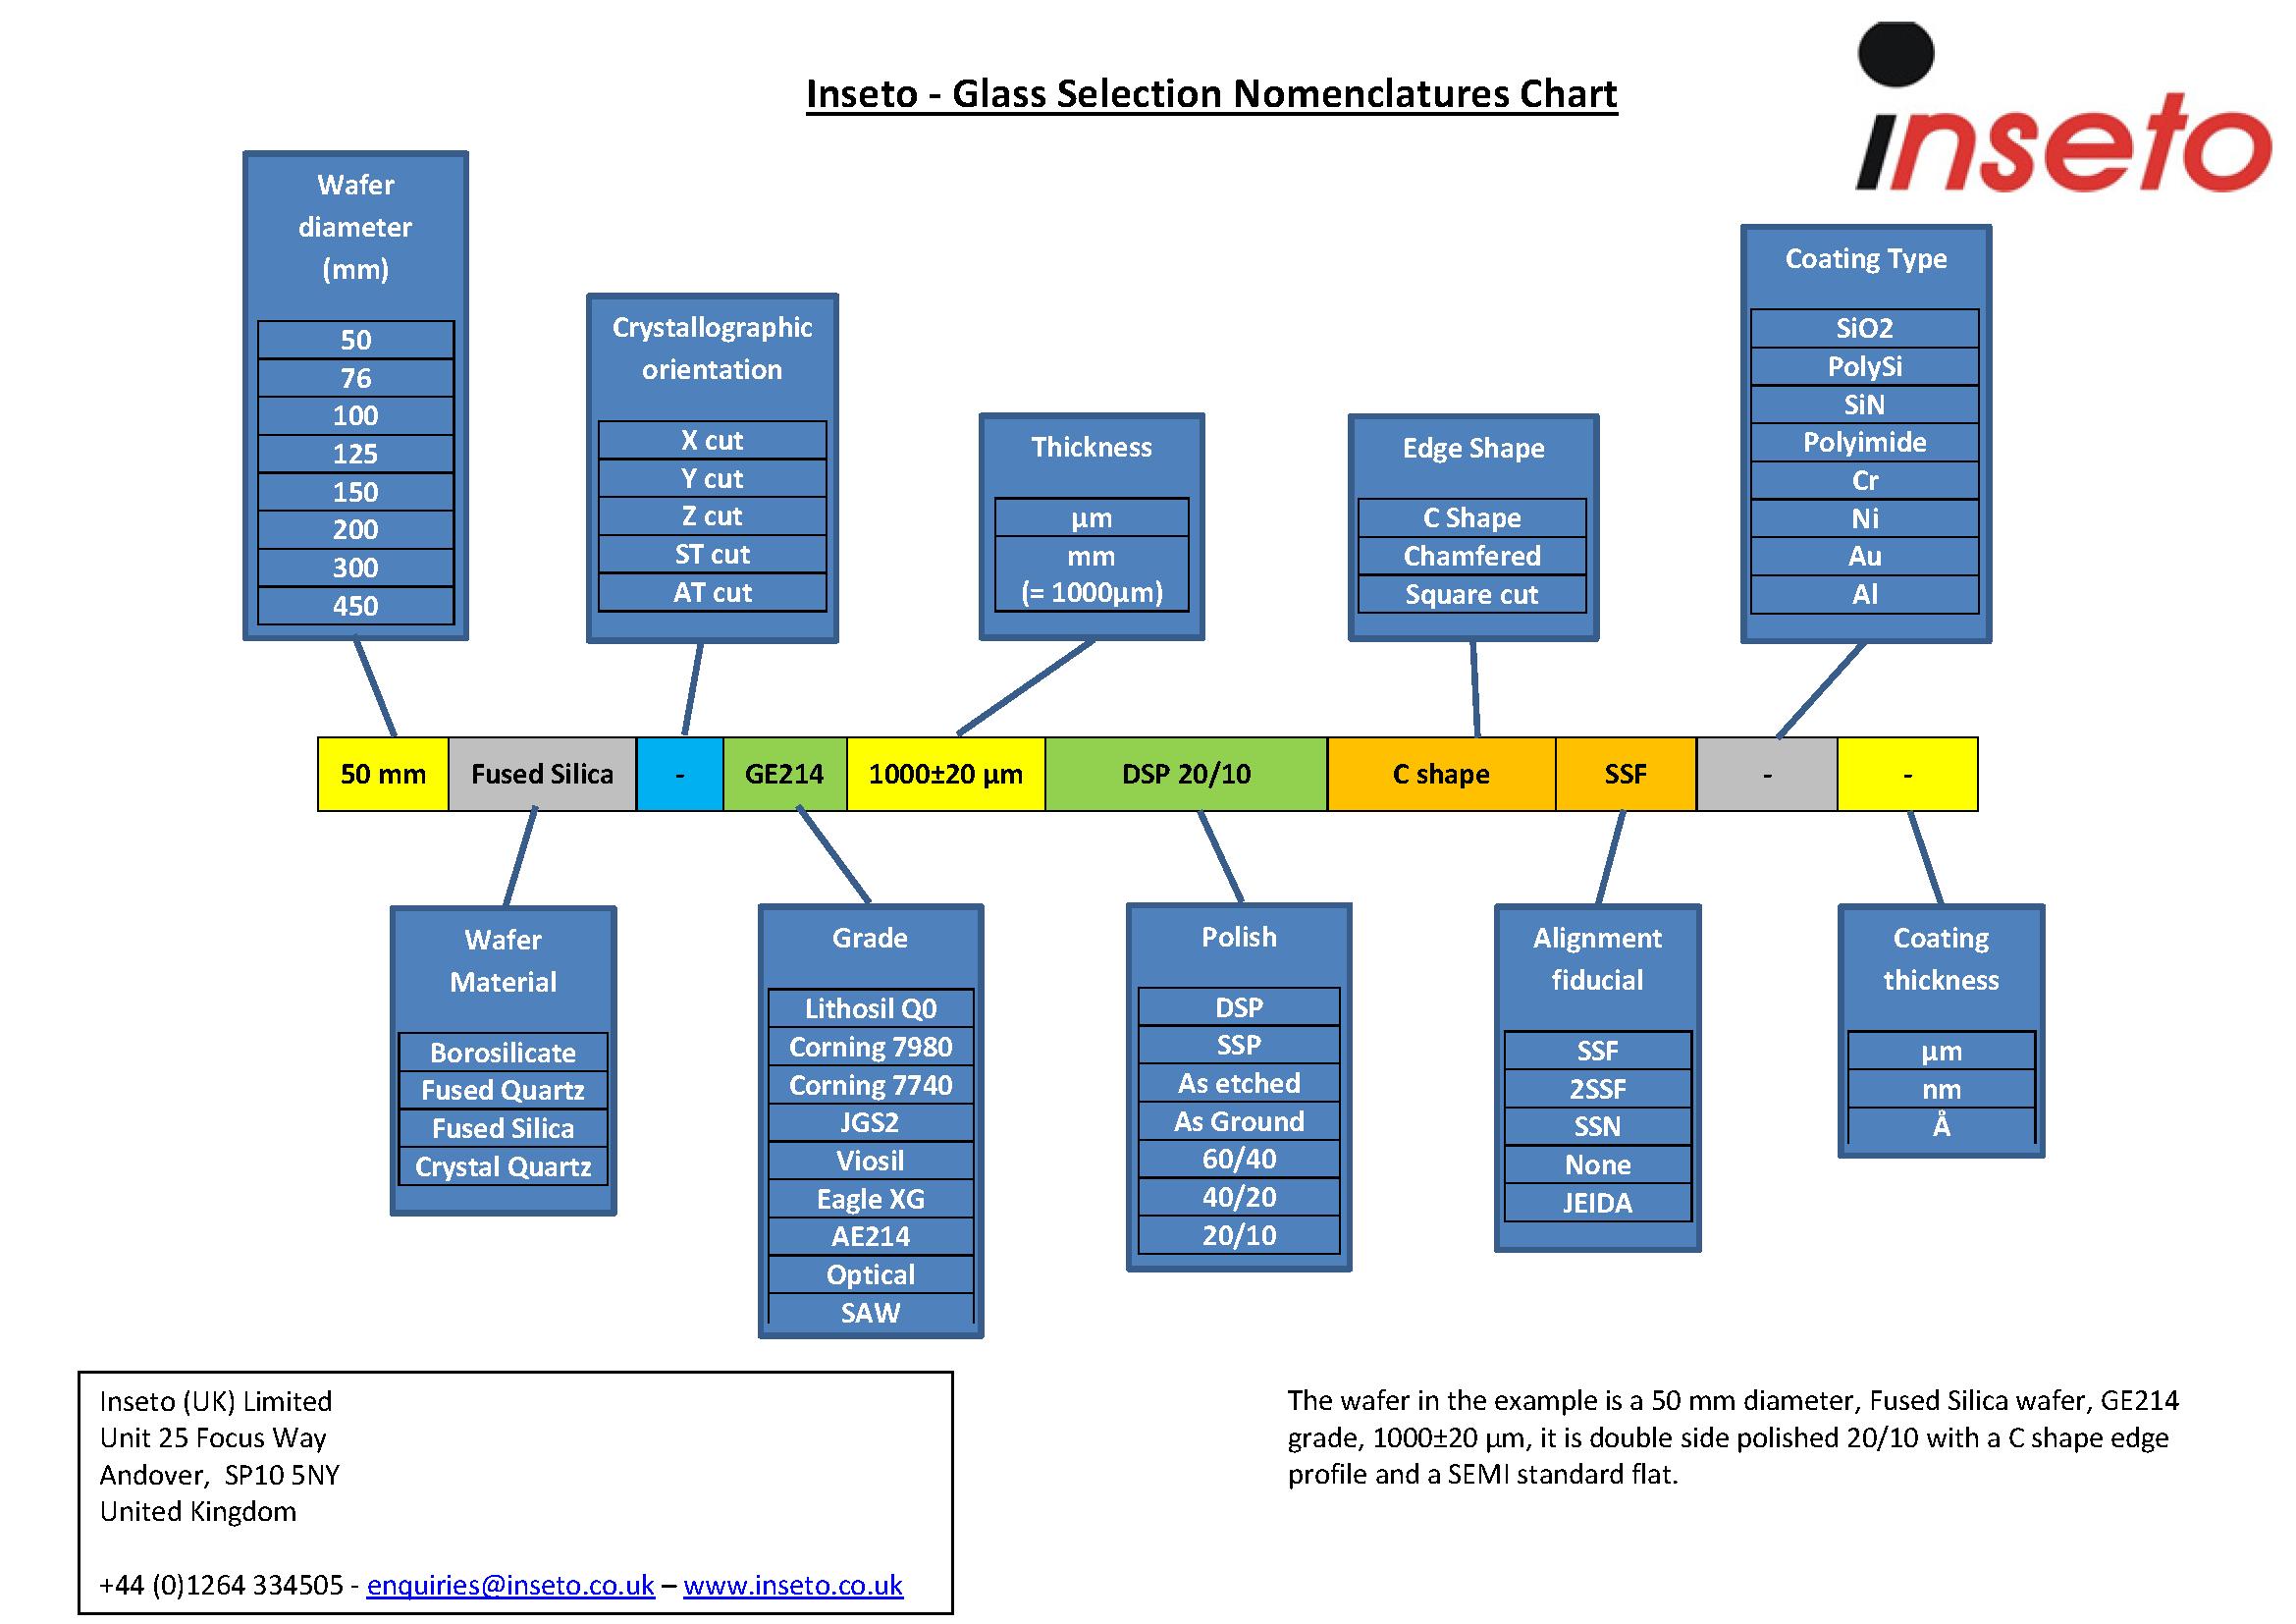 Glass Wafer Nomenclature Chart